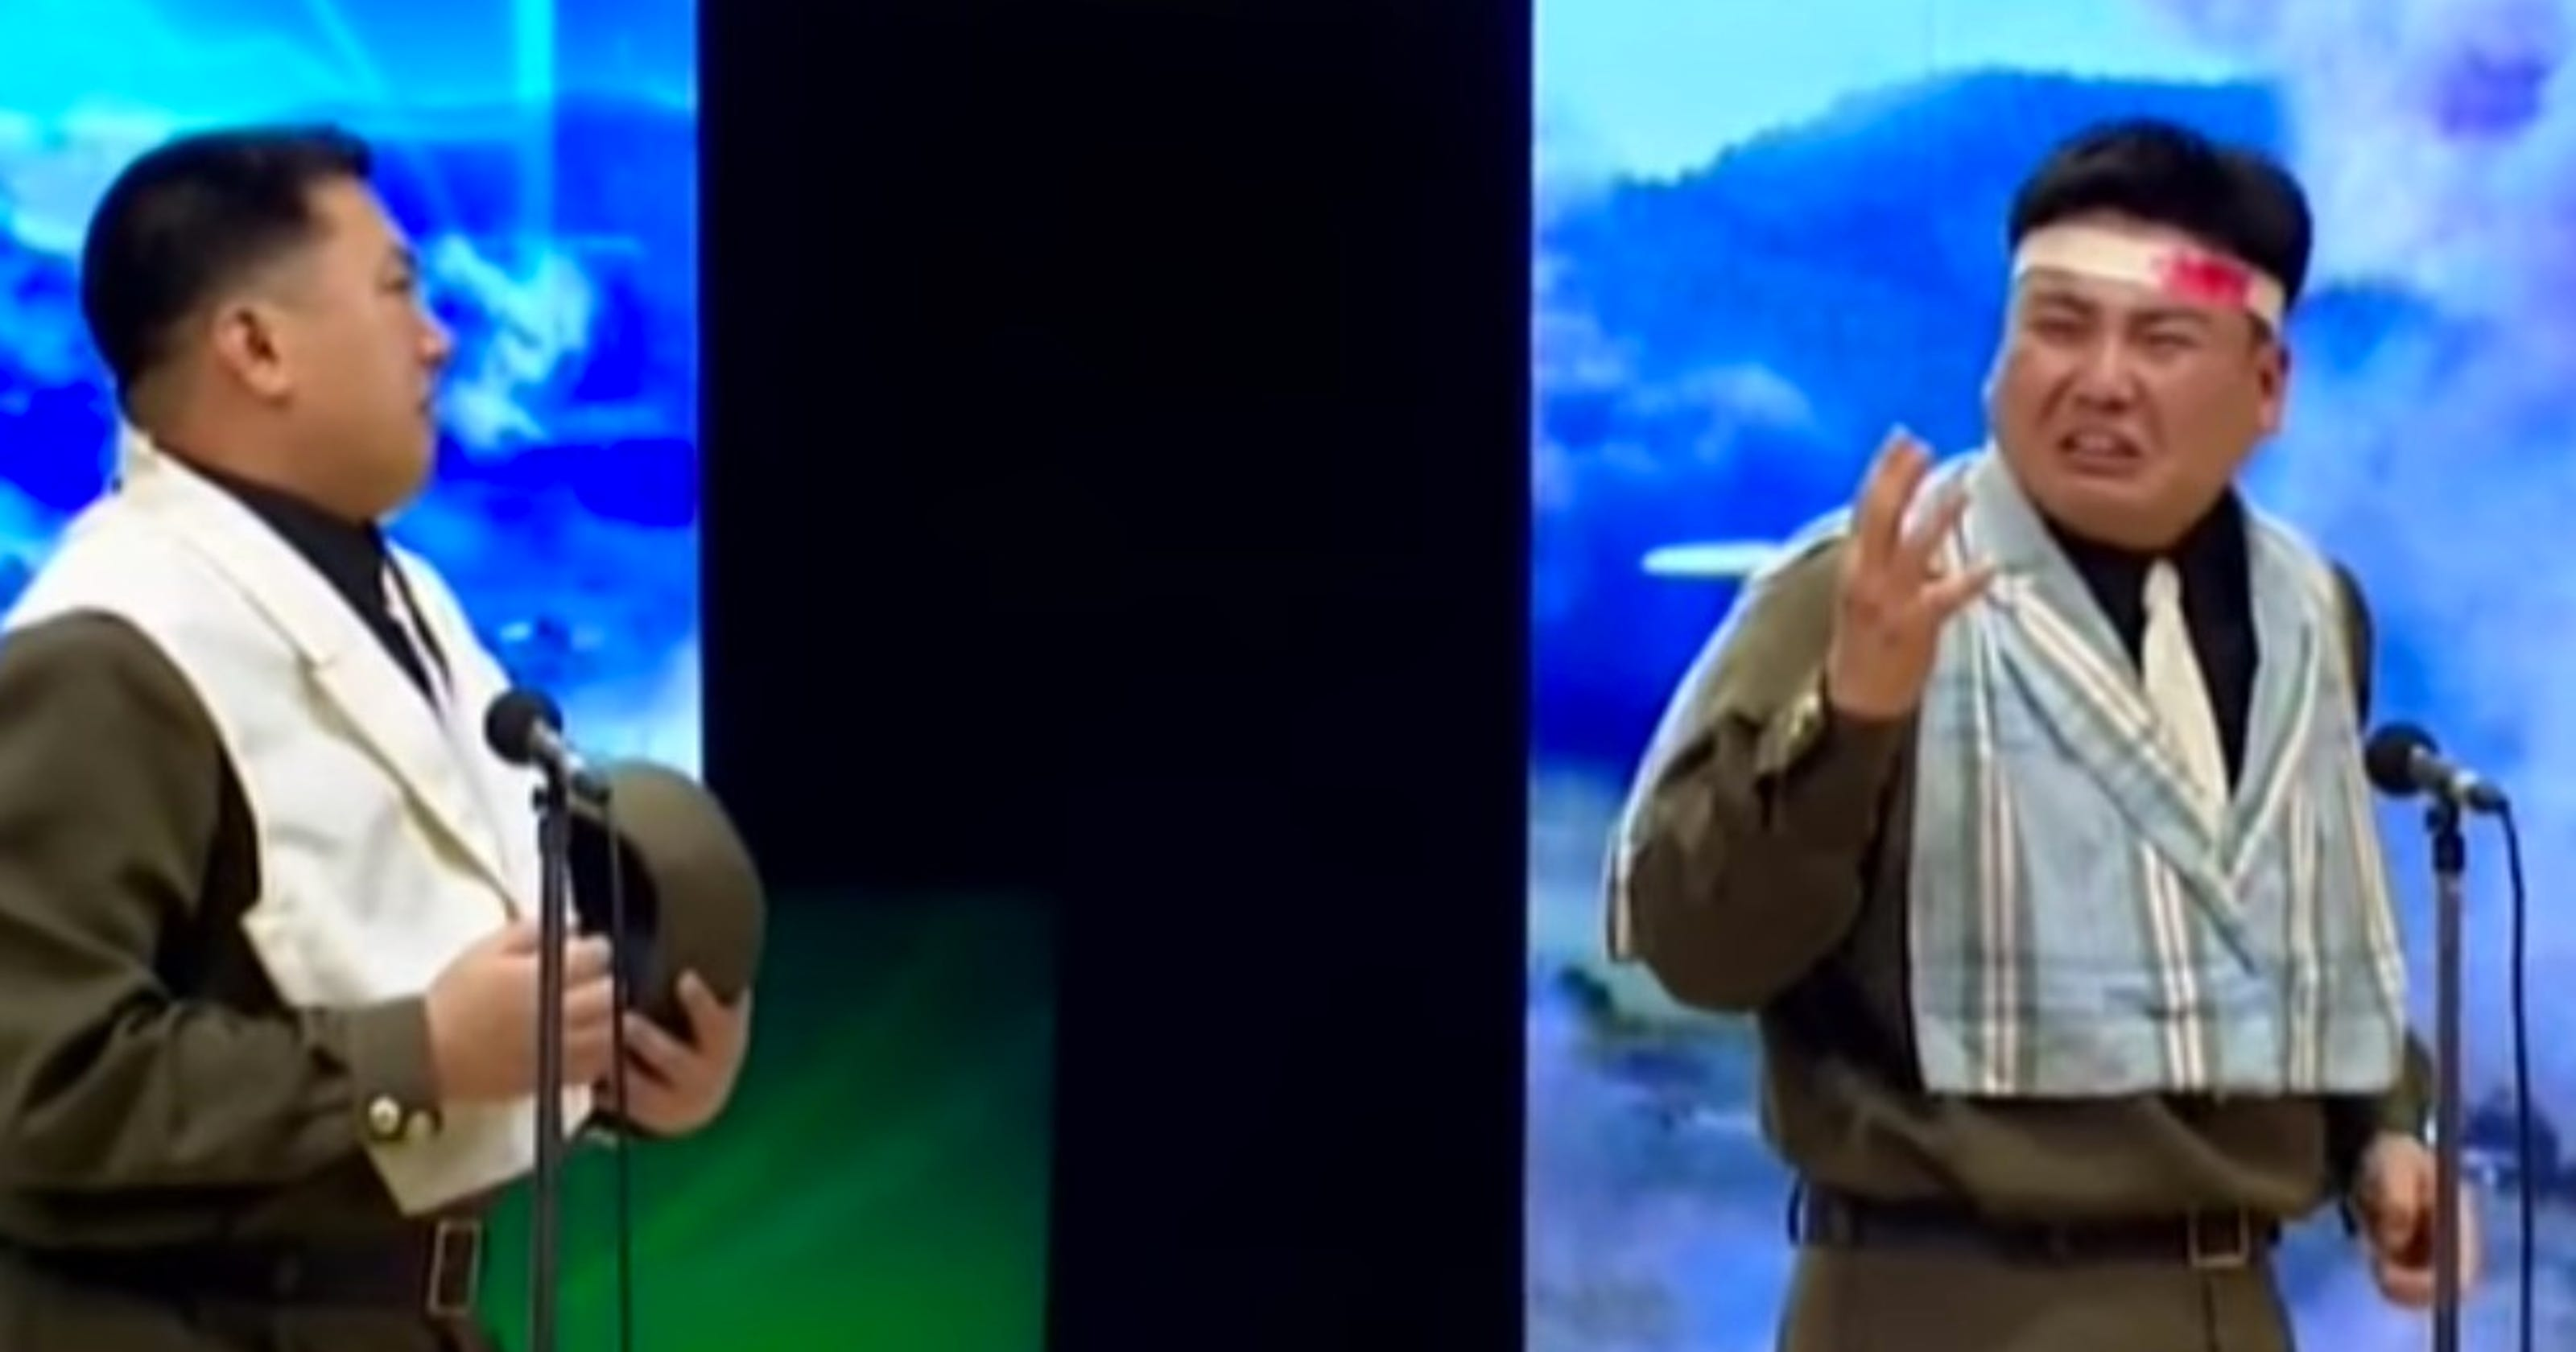 North Koreas Attempt At Humor Tv Show Mocks Obama